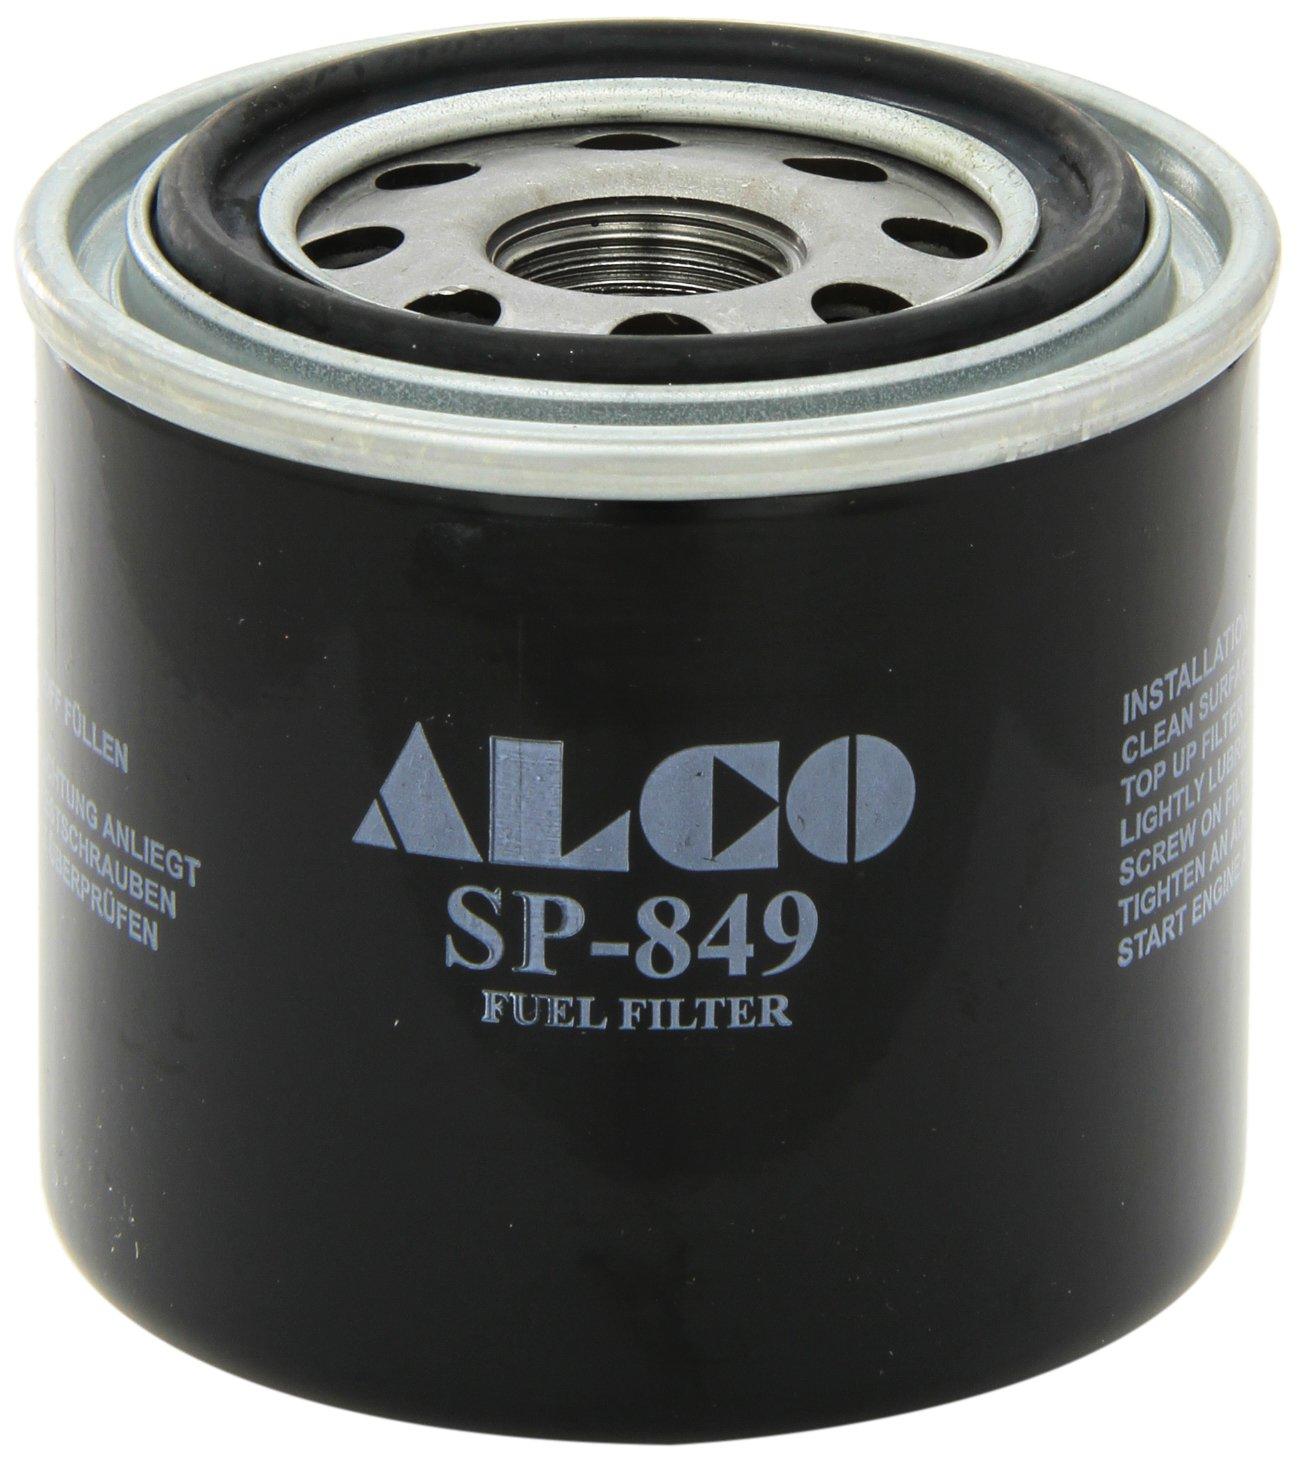 Alco Filter SP-849 Fuel filter Alco Filter Gmbh